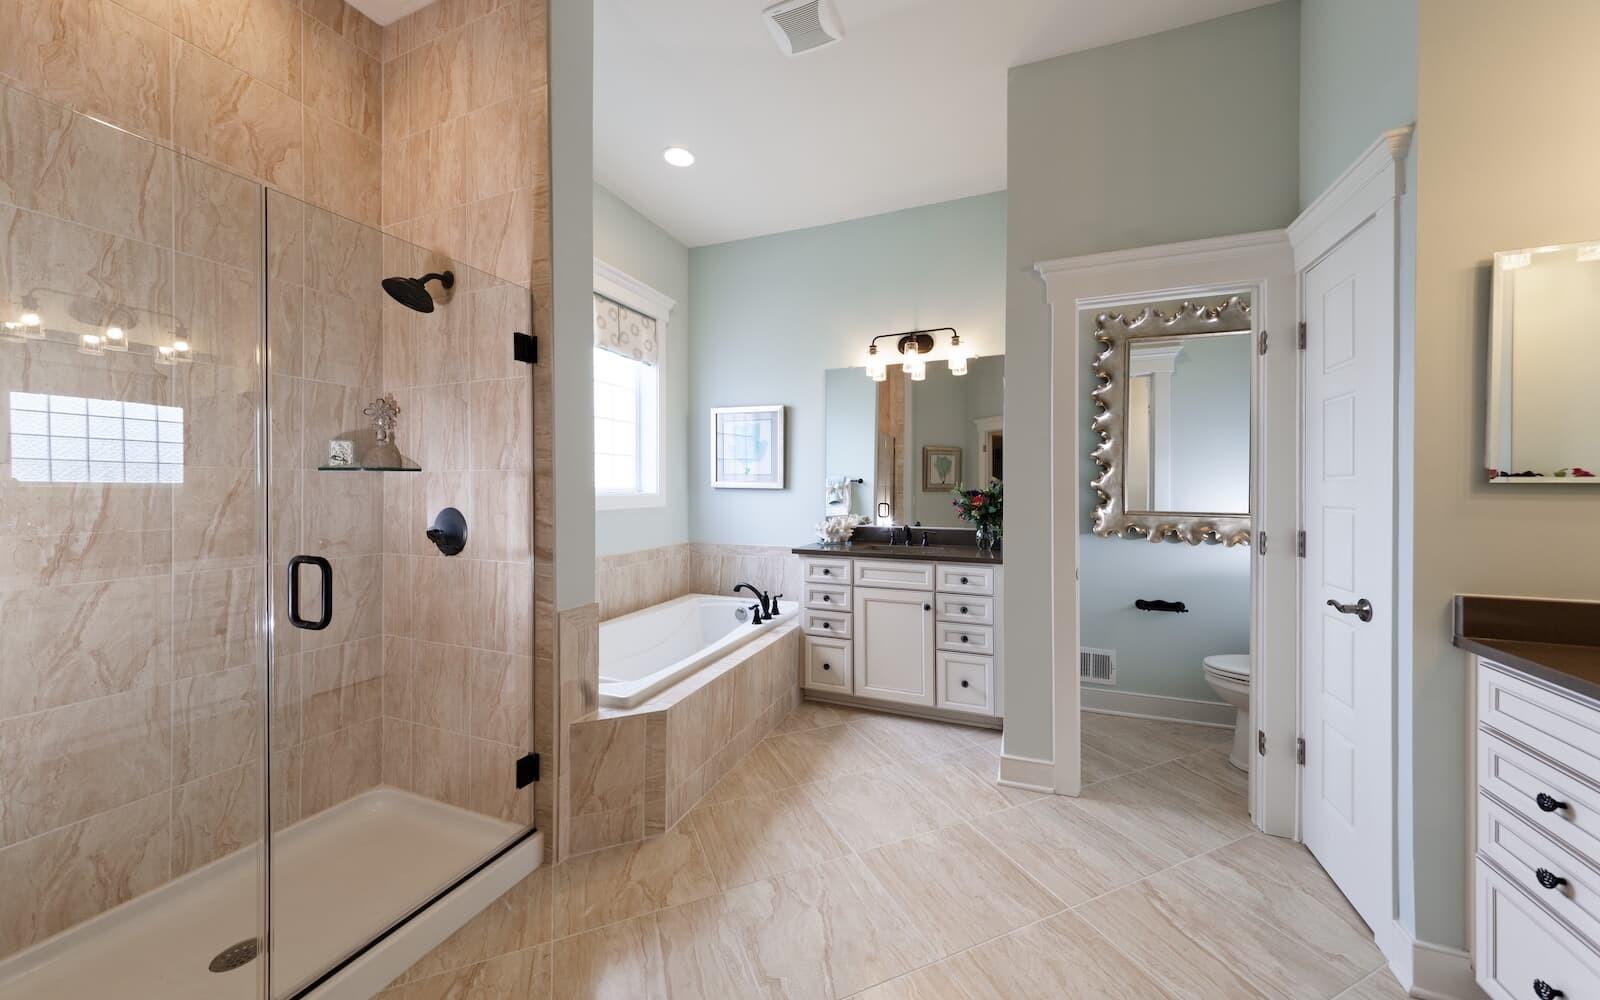 Pearson-owners-bathroom-single-family-homes-easton-md-easton-village-brookfield-residential.jpg